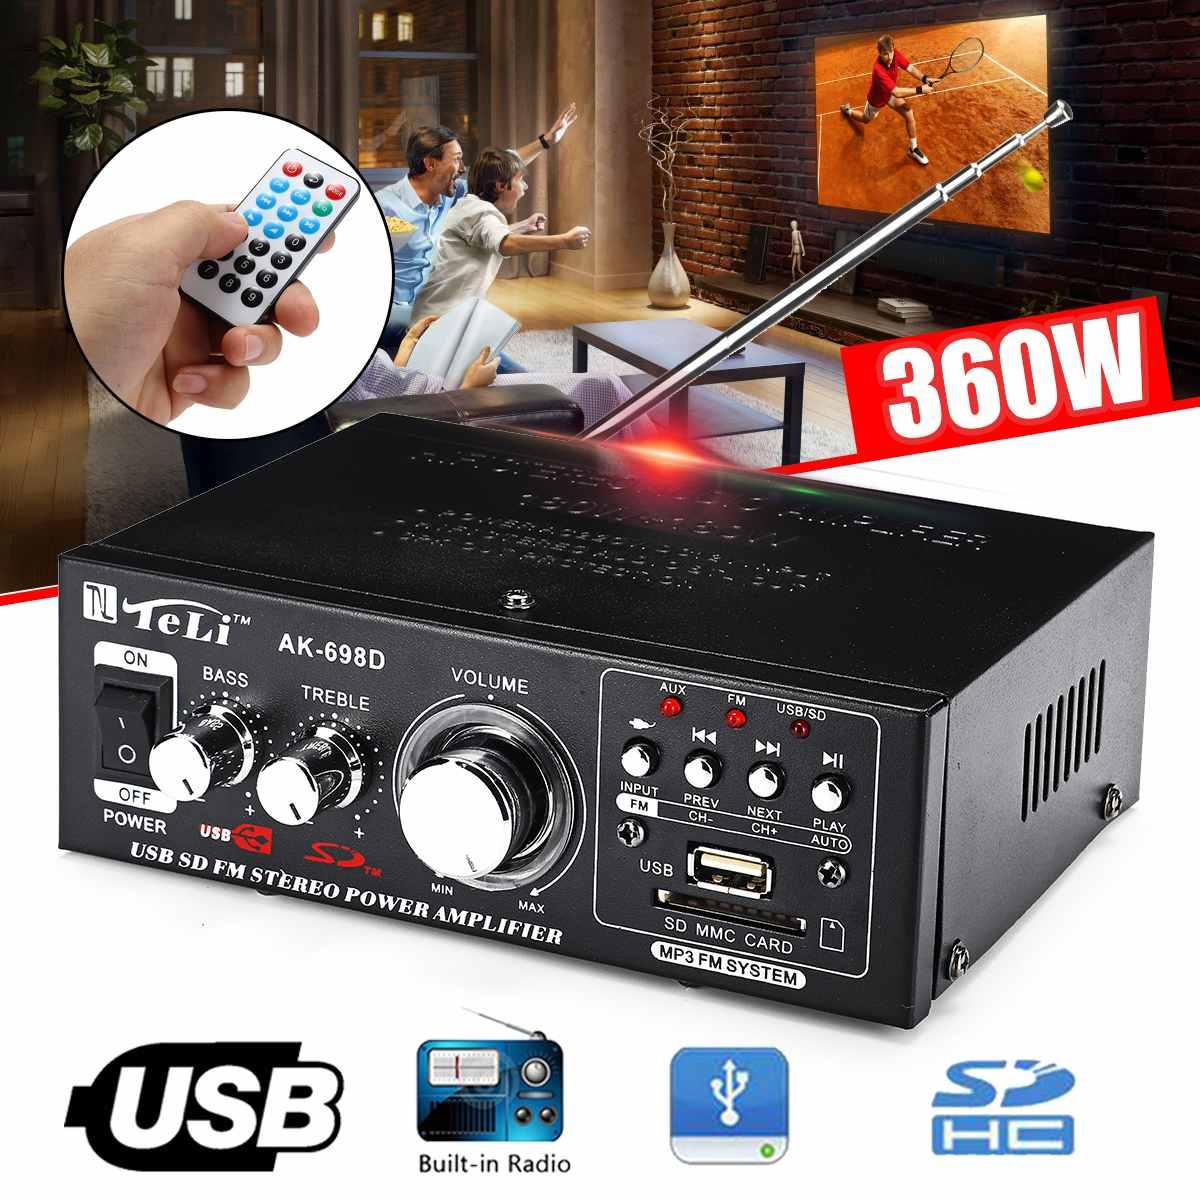 Trustful 360w 12v/220v Hifi Audio Stereo Power Amplifier Fm Radio 2ch Car Home Amplificador Audio With Remote Control